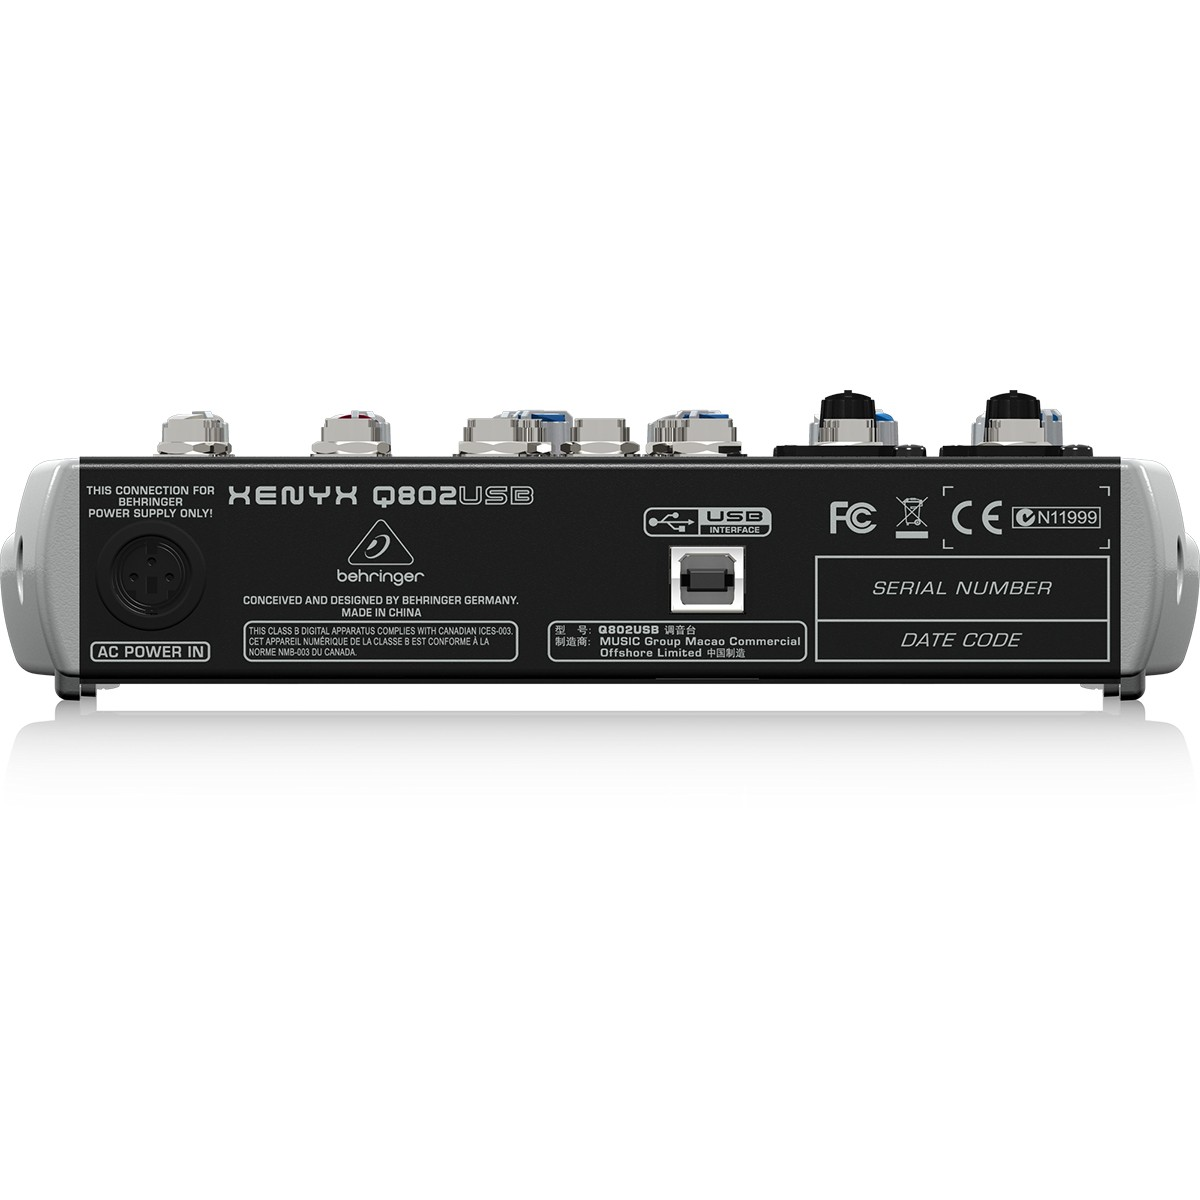 Behringer Xenyx Q802Usb Mesa de Som de 8 Canais Compacta, Mixer Analógico, 220v